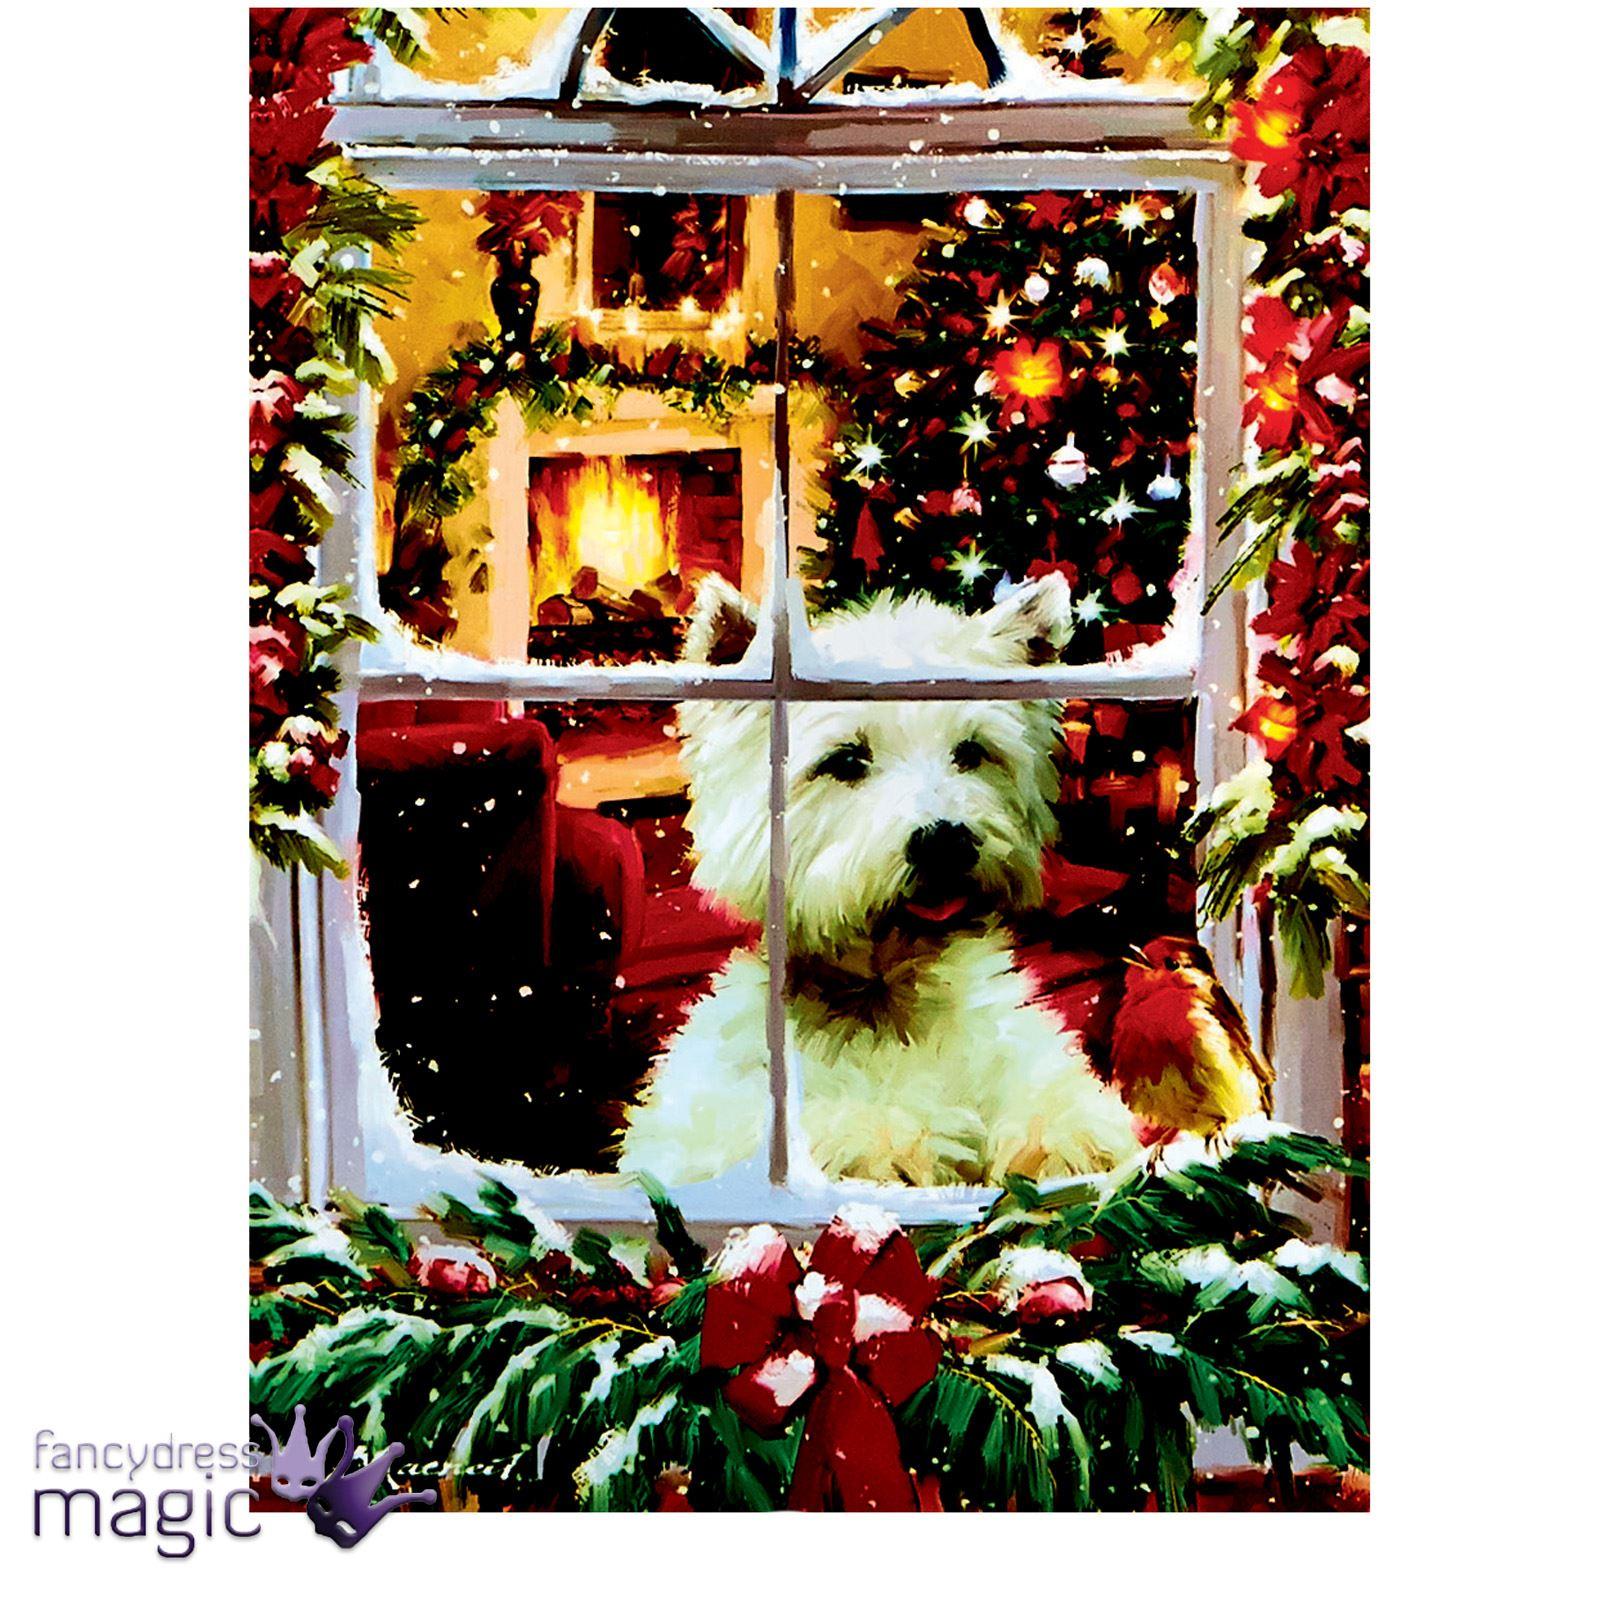 40 x 30cm christmas animal scene led canvas battery for Christmas wall art amazon